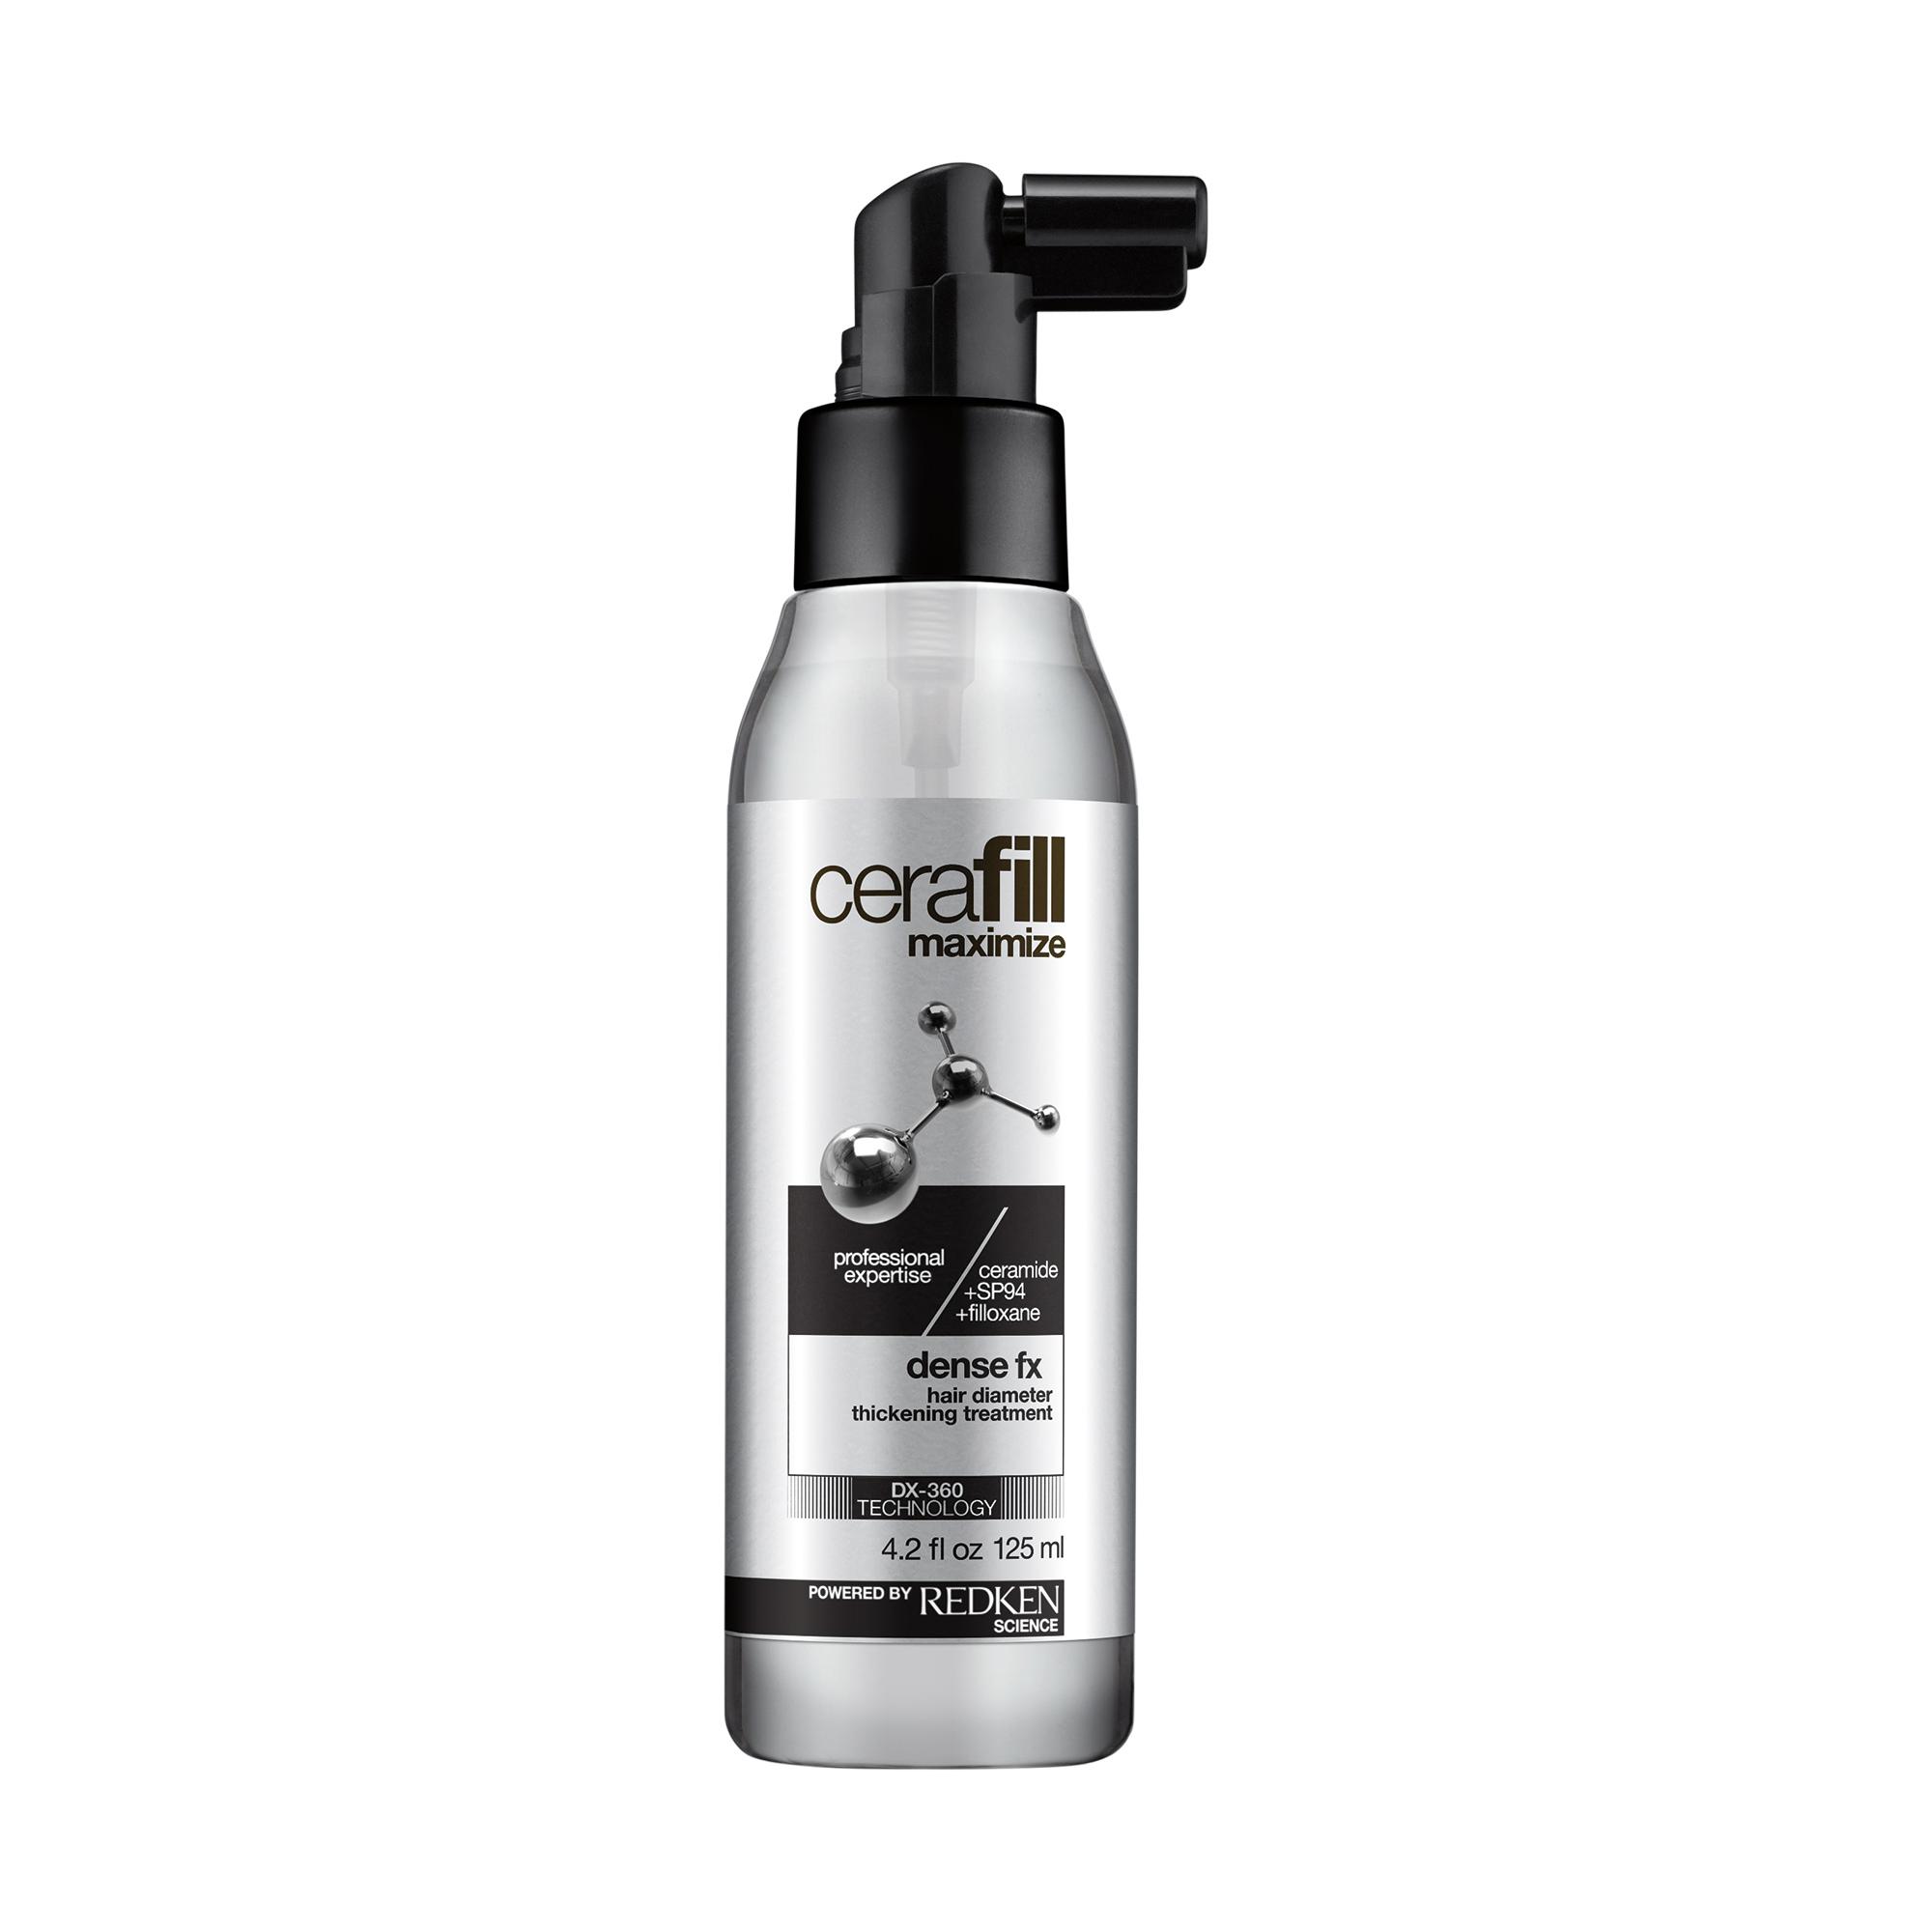 Cerafill Dense FX Treatment 125ml